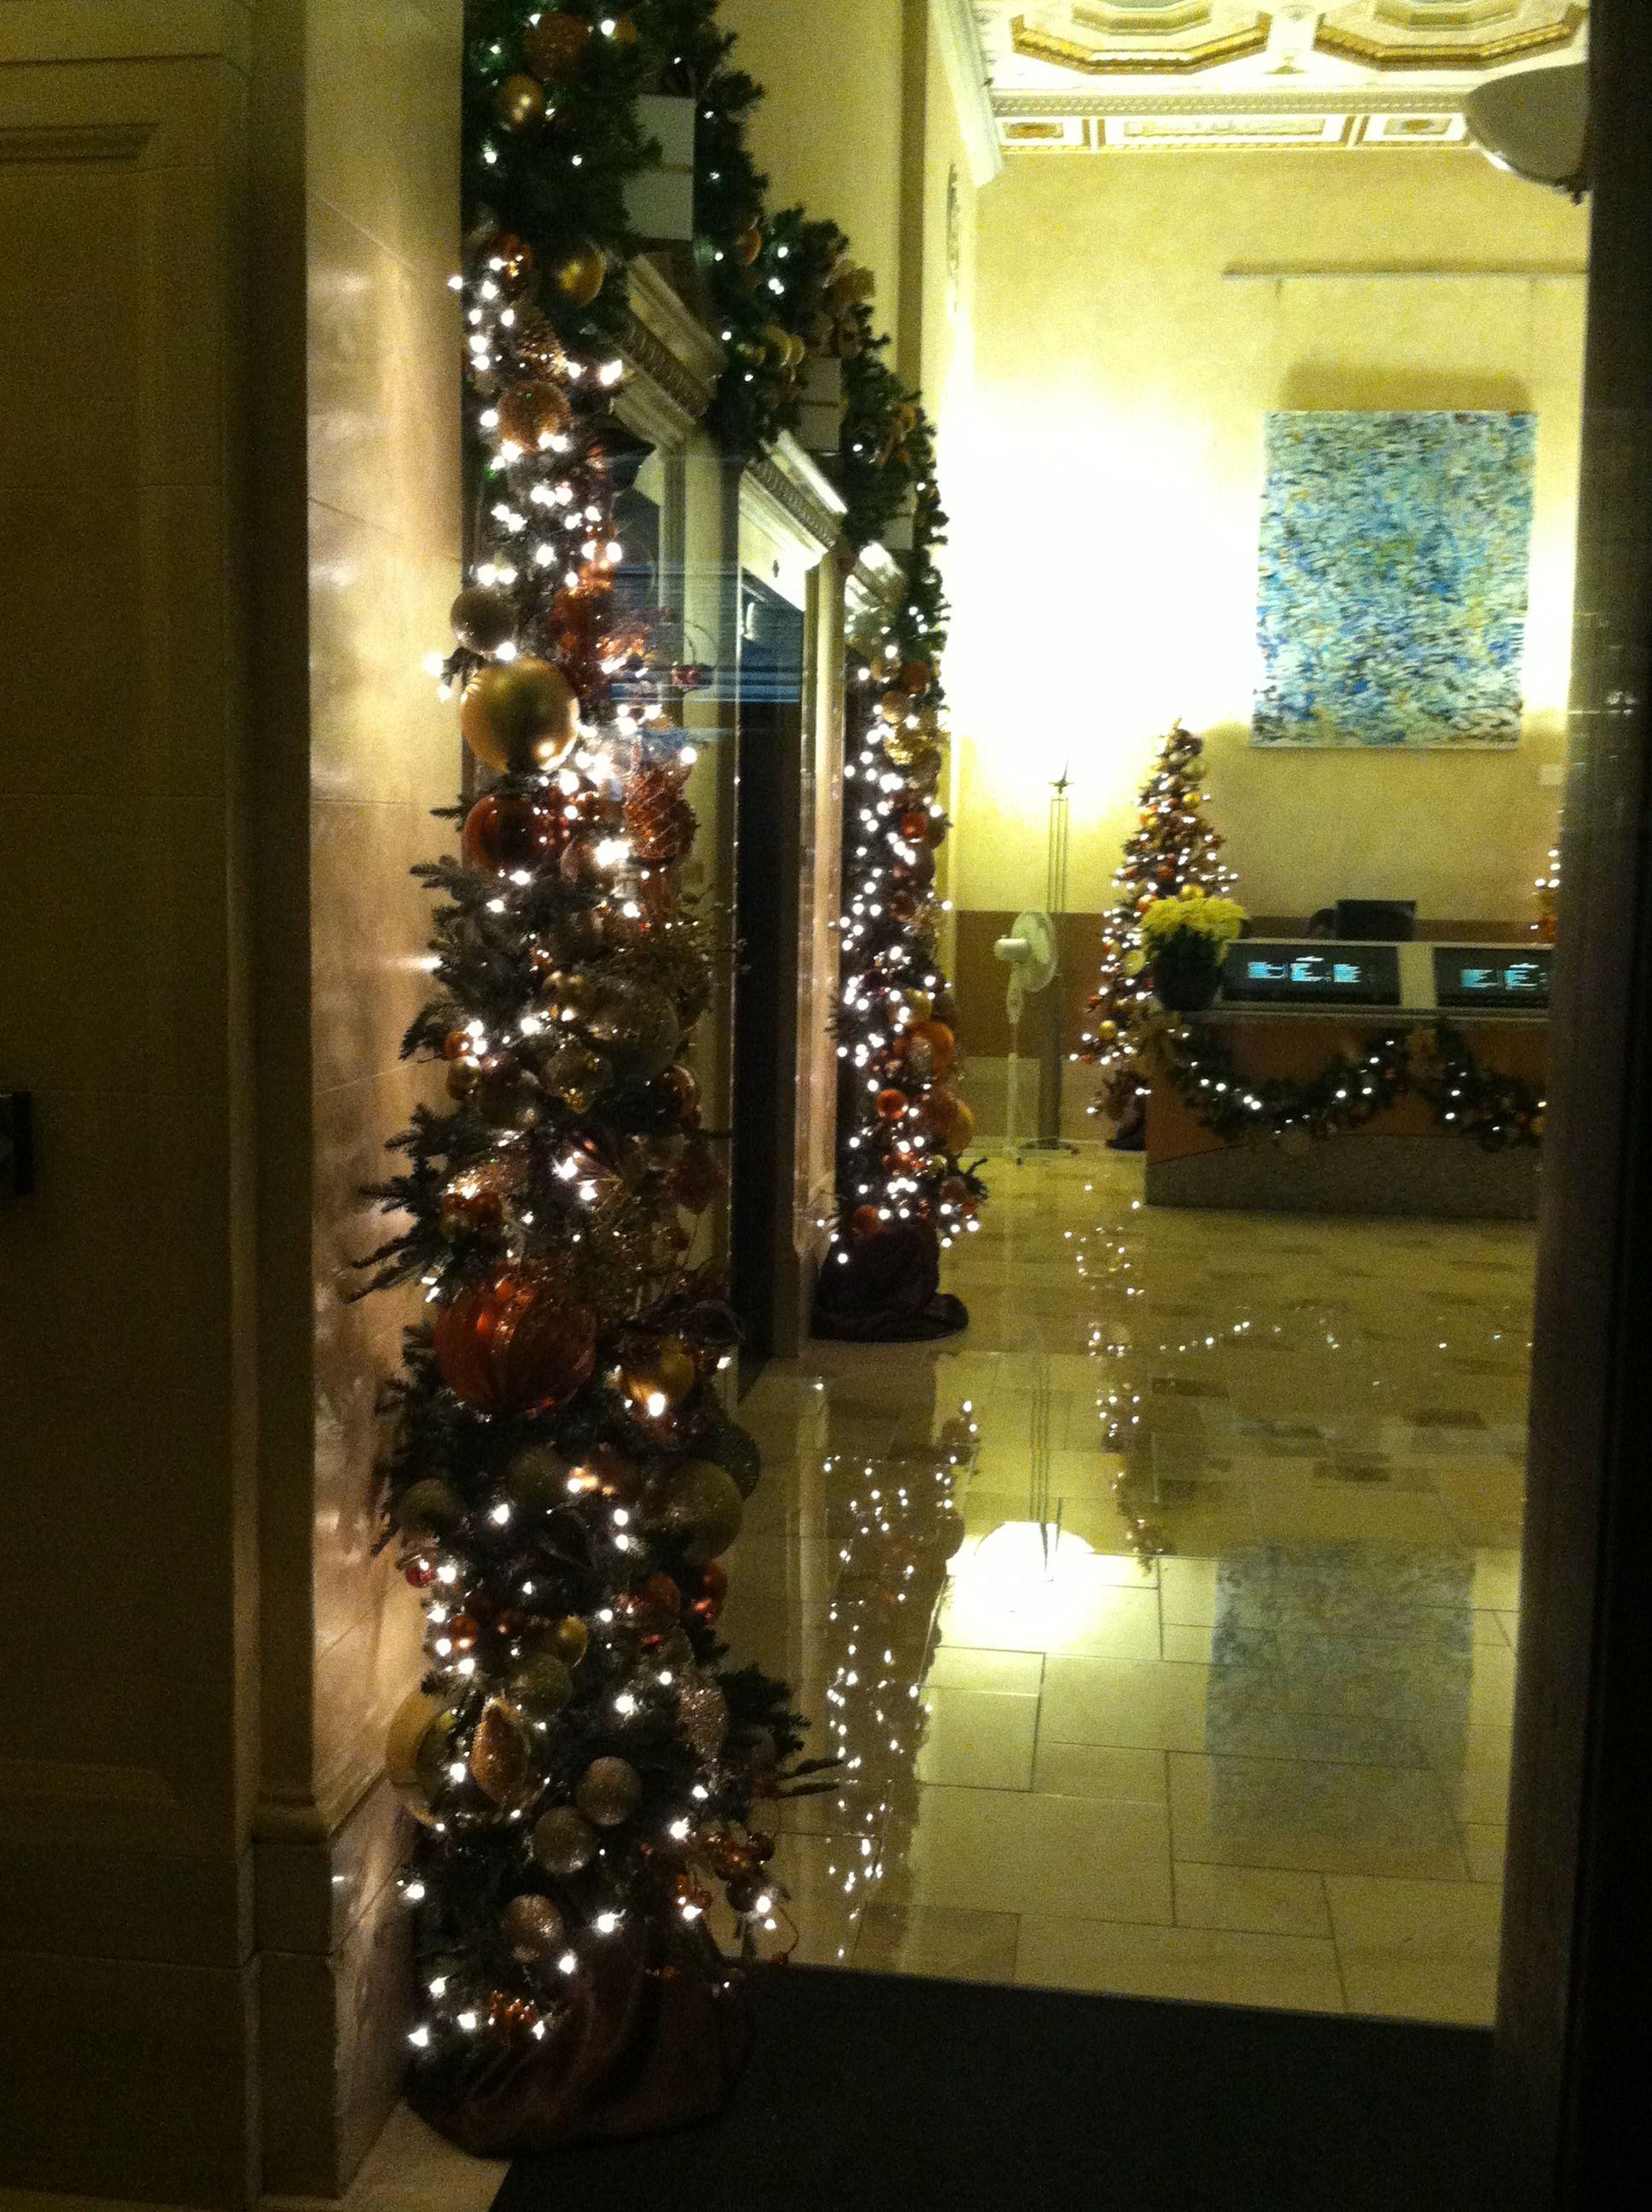 Elevator Lobby On Sansome Sf Fidi Lobby Christmas Decor By Http